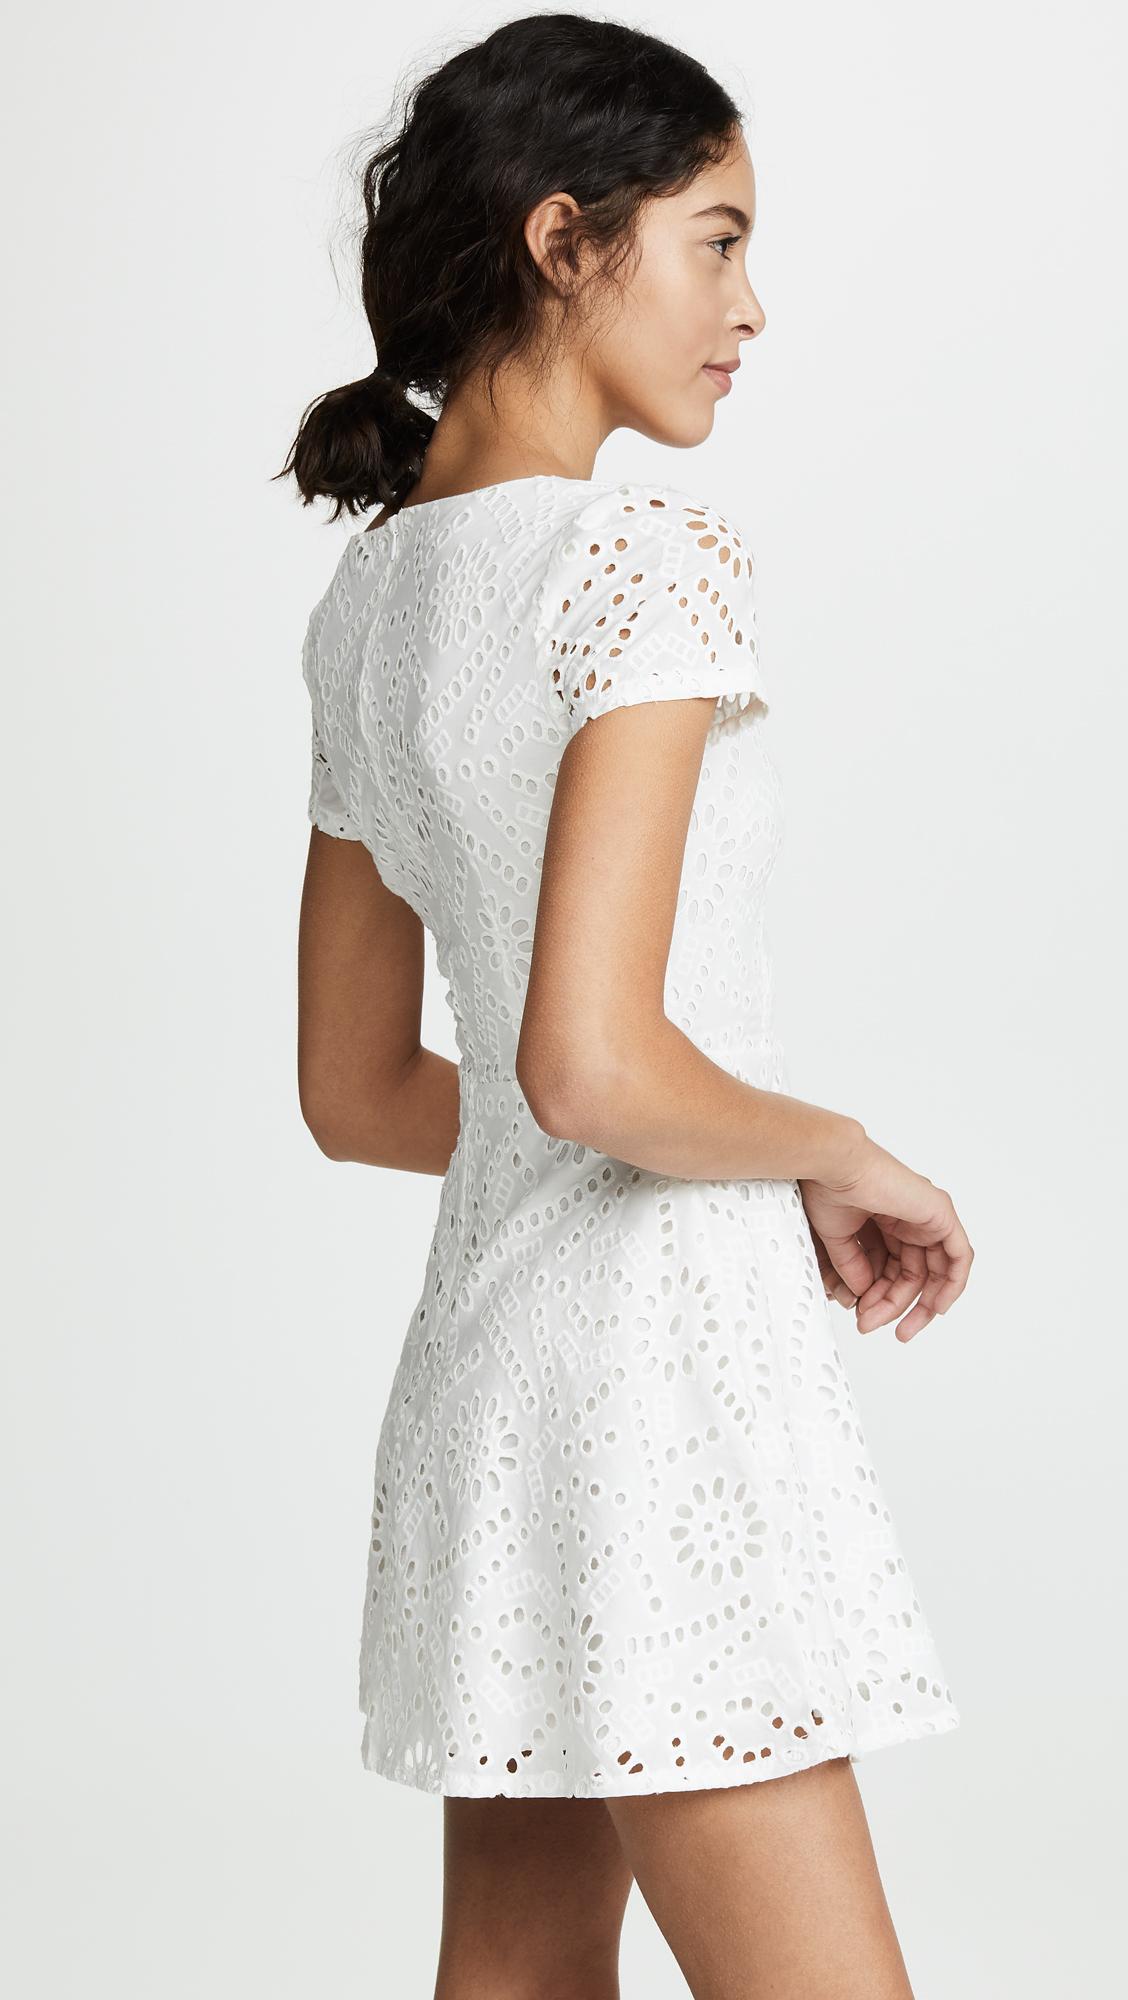 aad435d6026e Flynn Skye - White Maiden Mini Dress - Lyst. View fullscreen